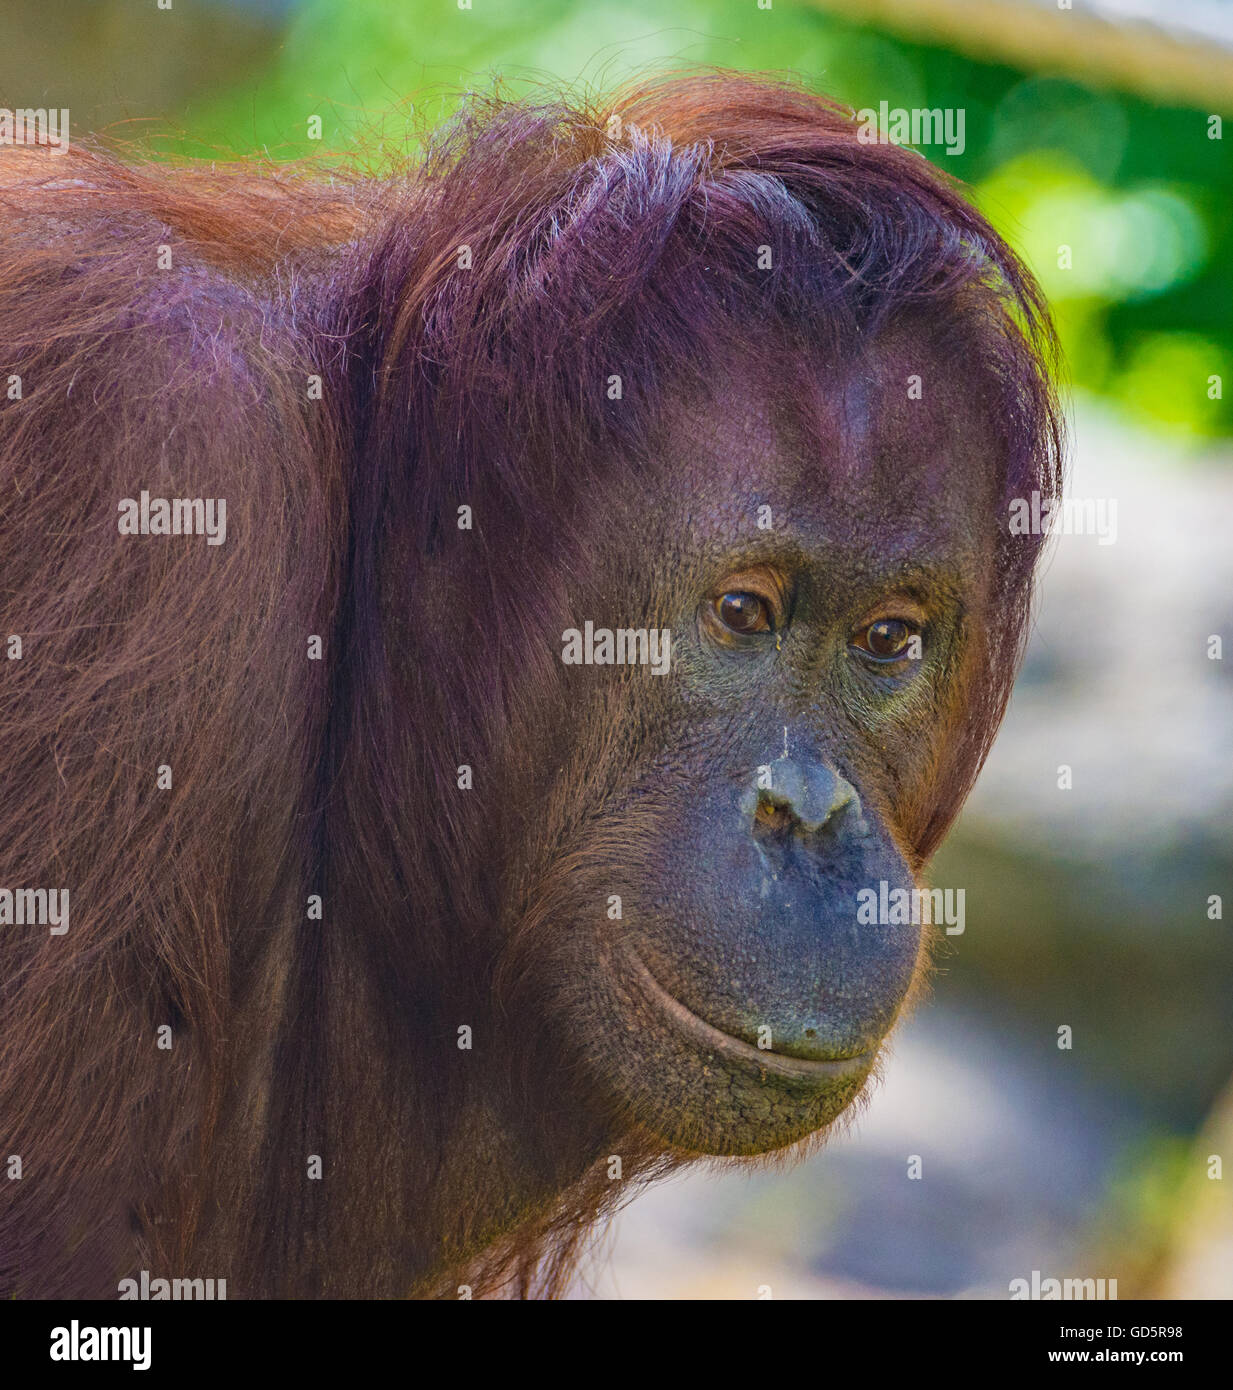 Orangutan - Stock Image